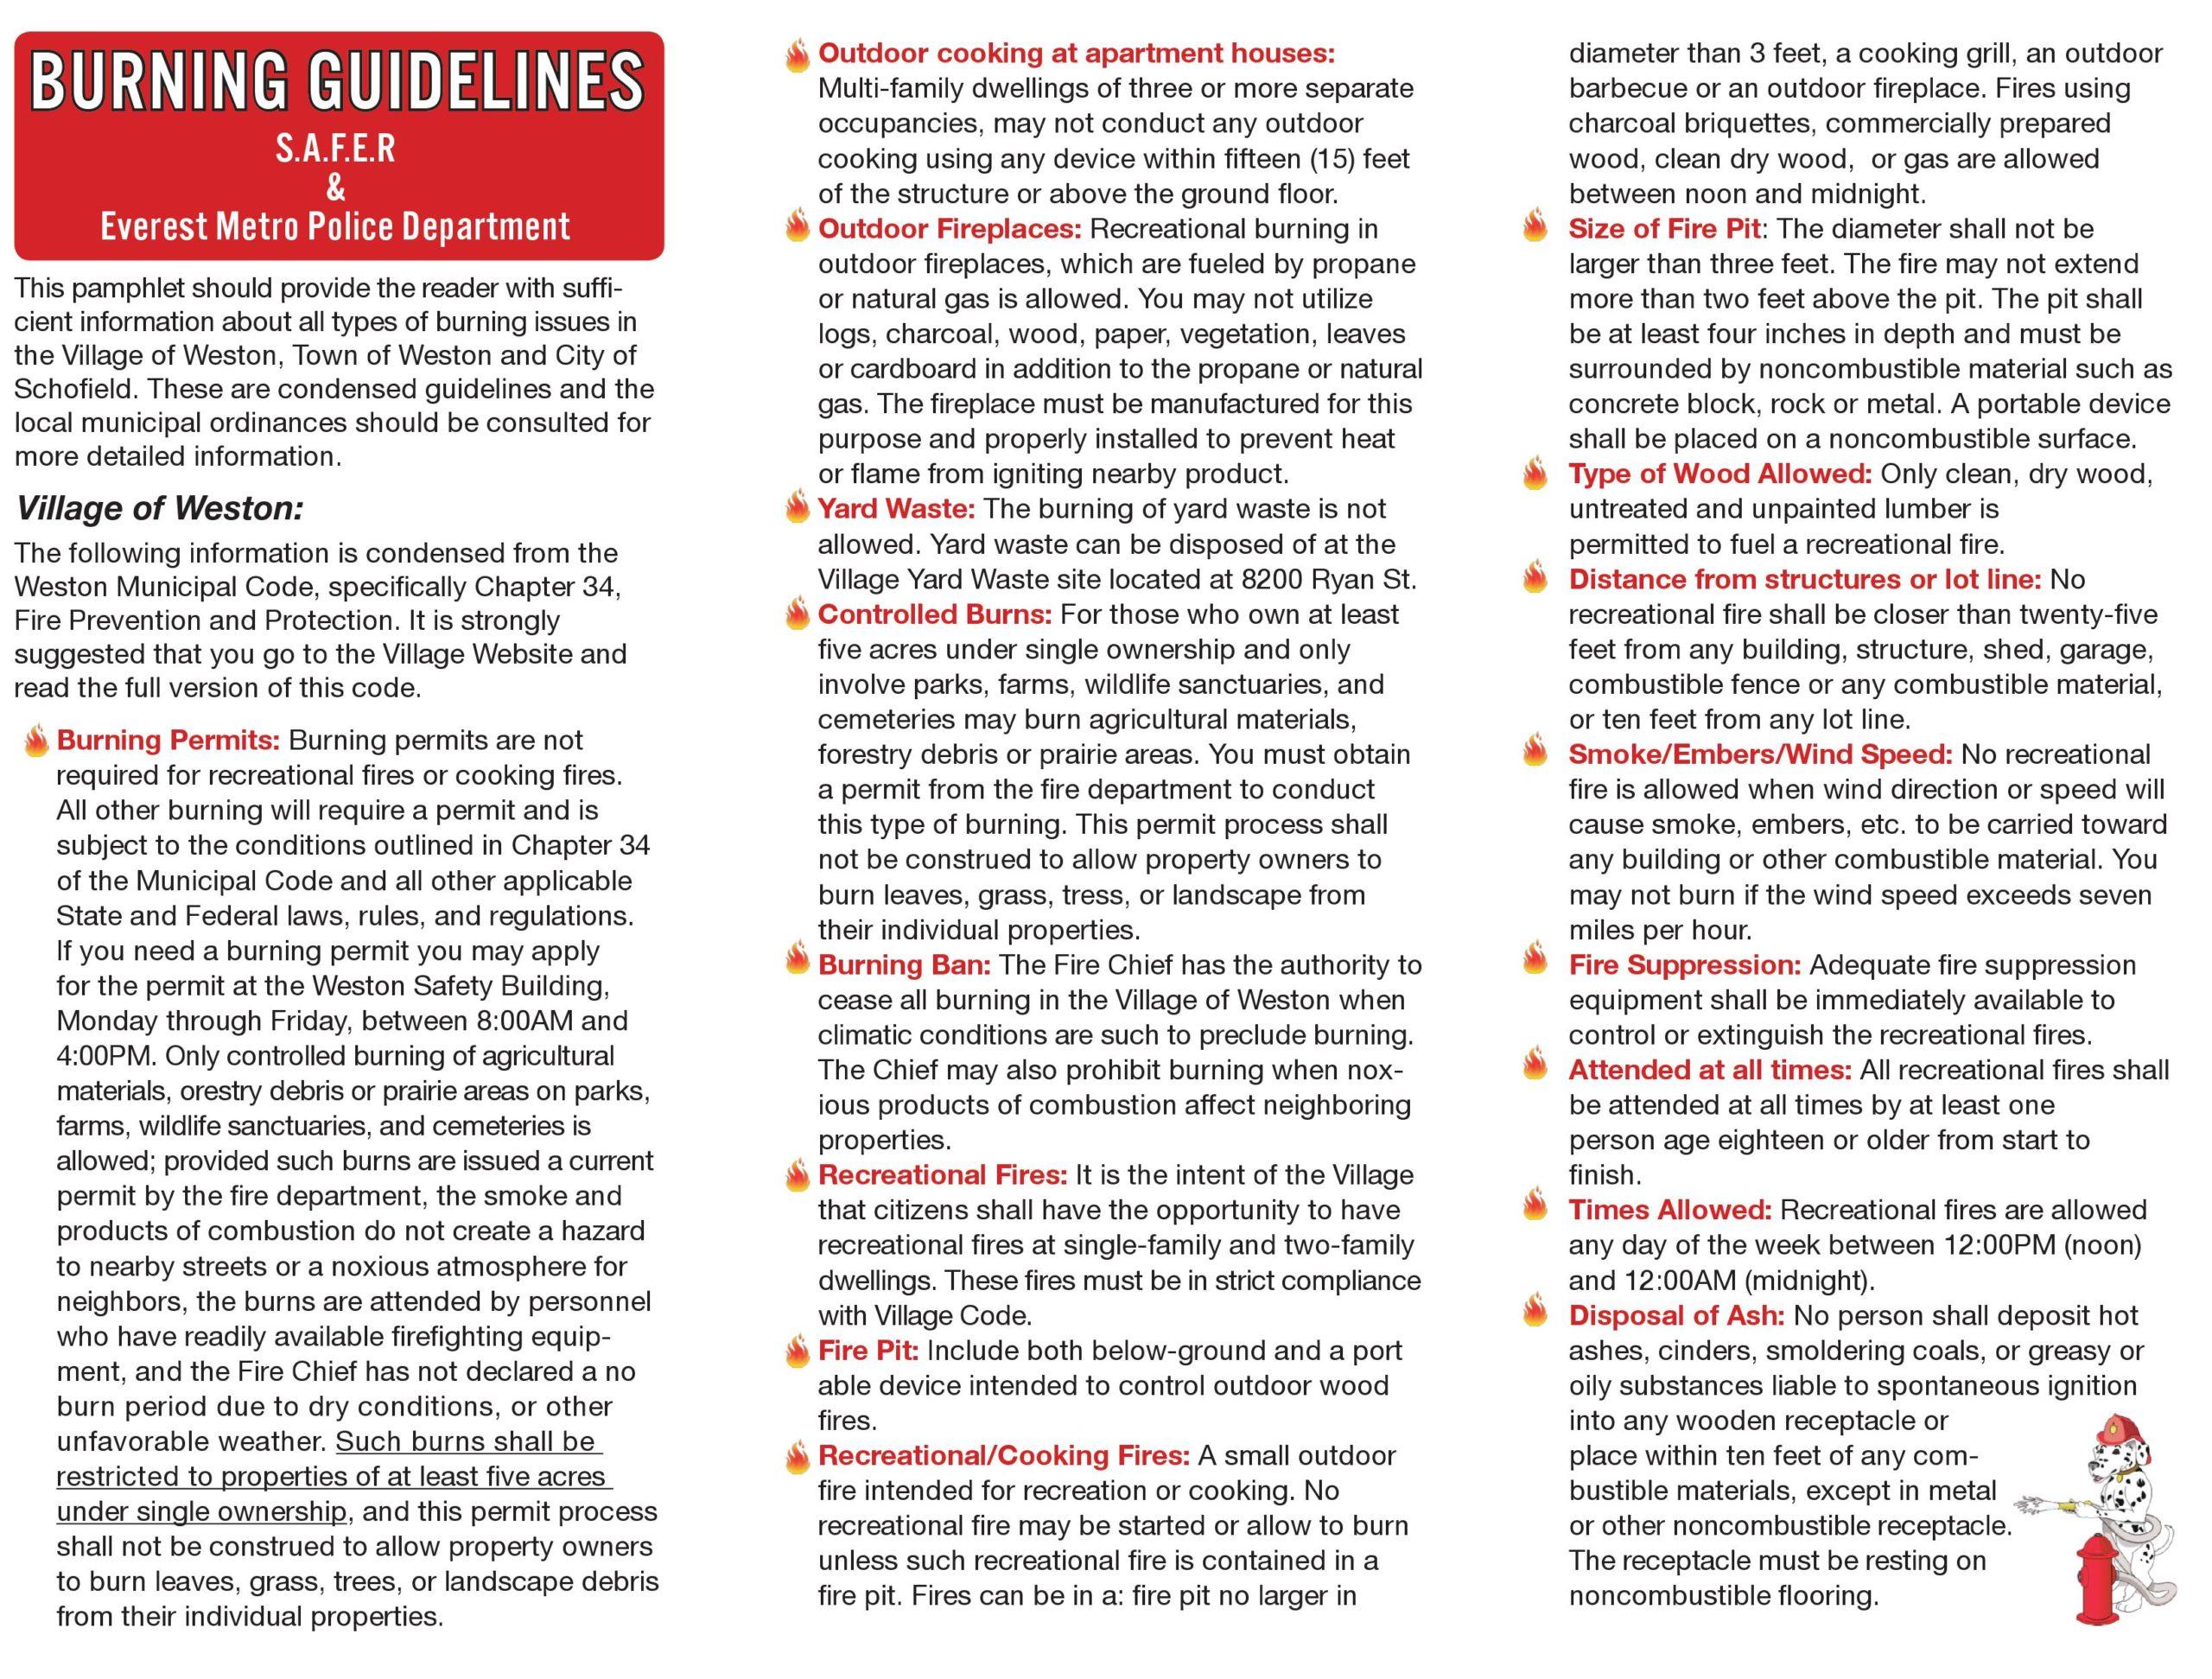 Burning Guidelines 0001